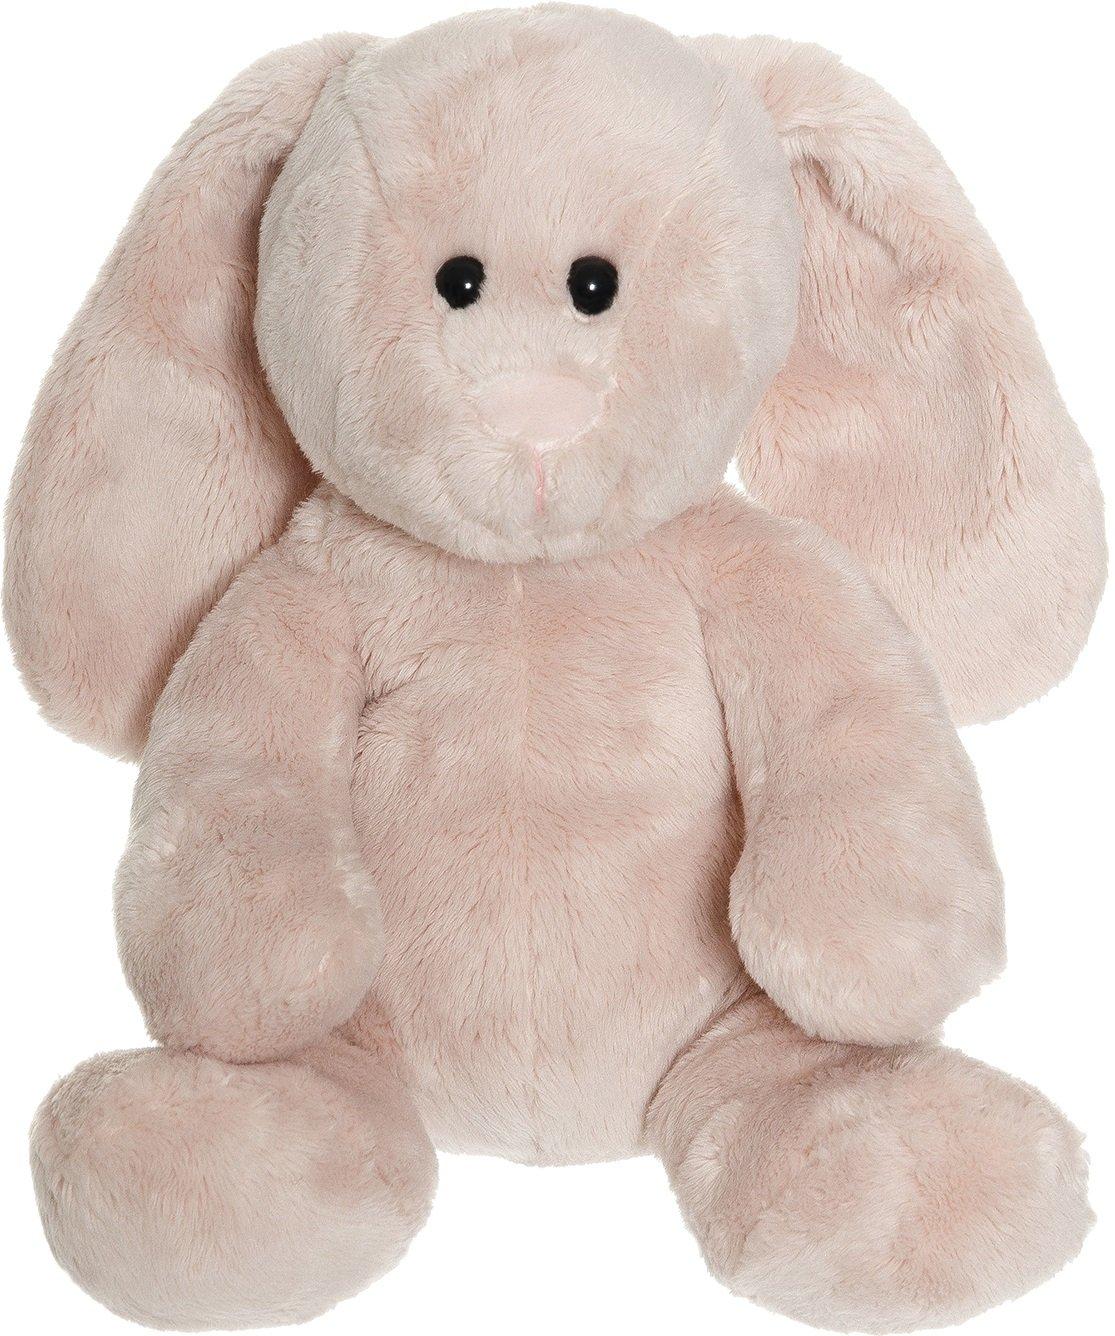 Teddykompaniet Wilma Kaninbamse Blush